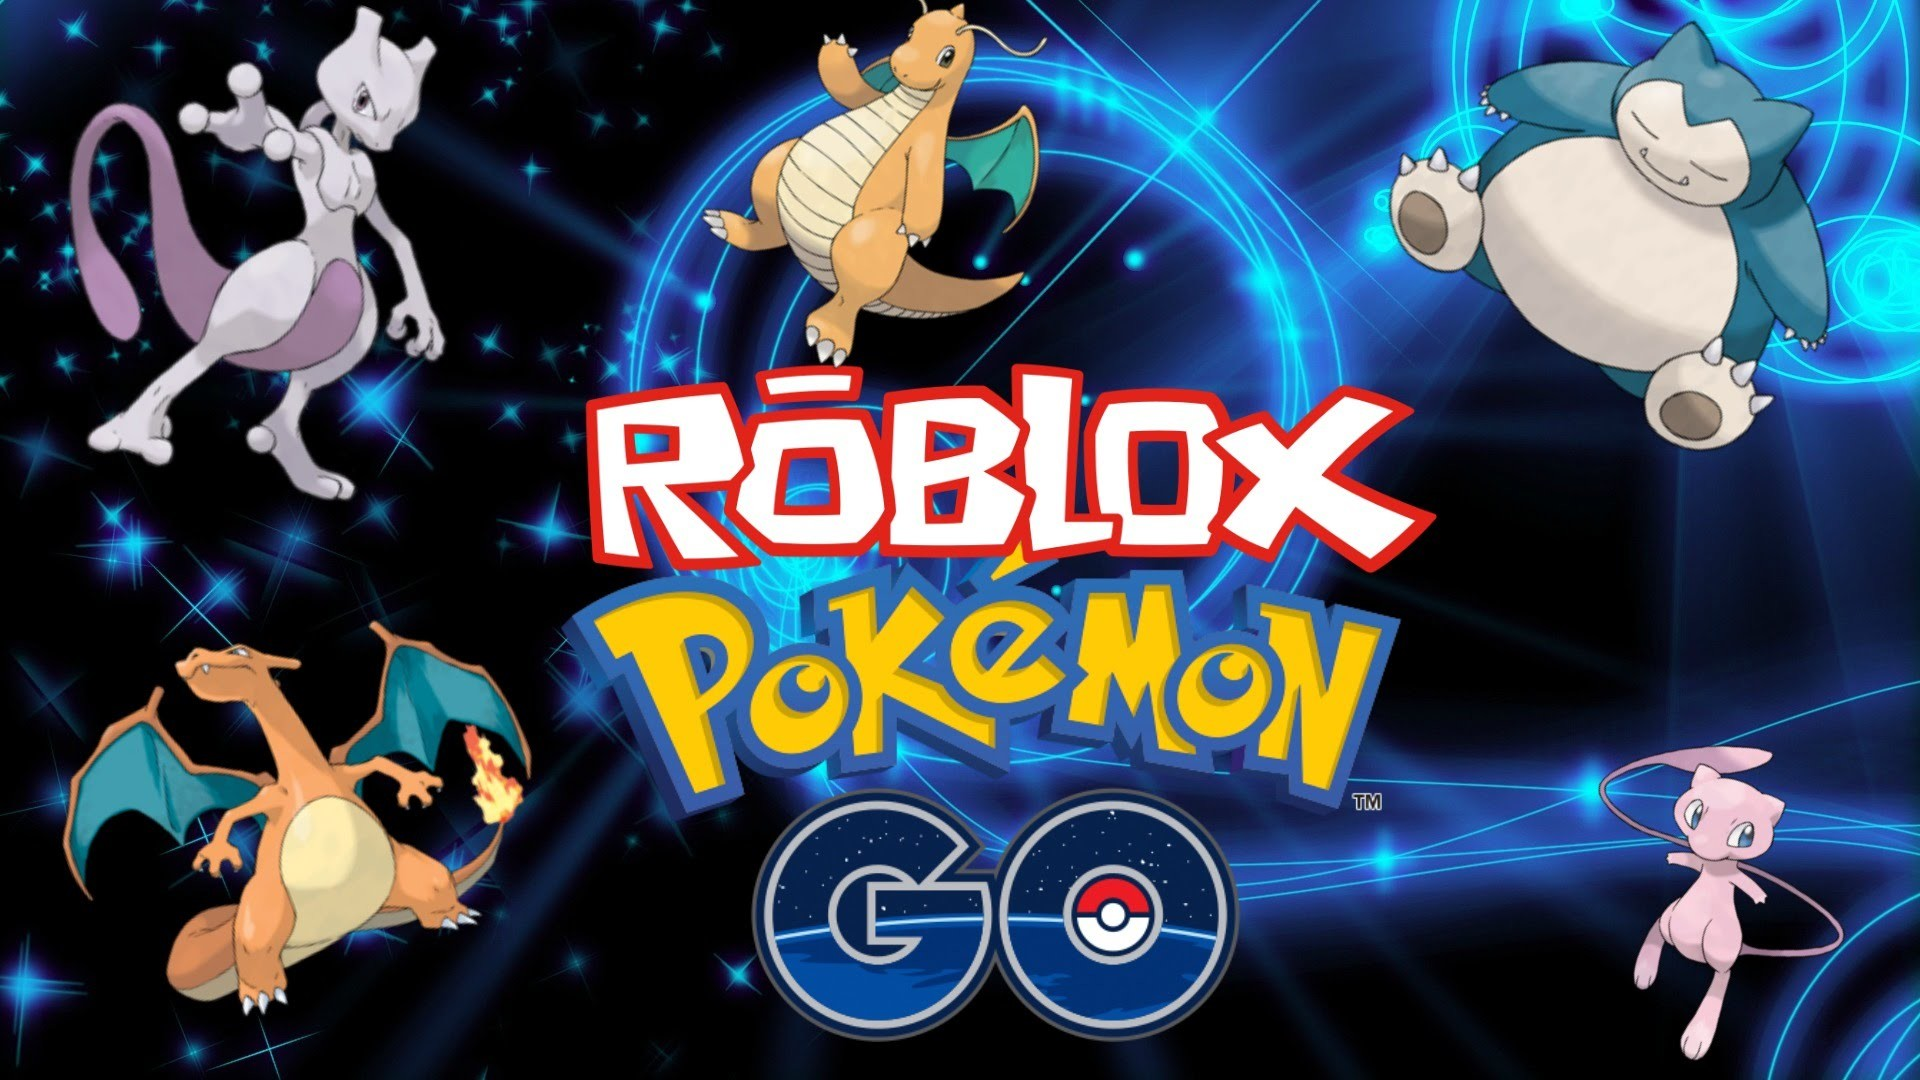 ROBLOX Pokemon Go – How to get Mew, Mewtwo, Snorlax, Dragonite & Charizard  (LEGIT)